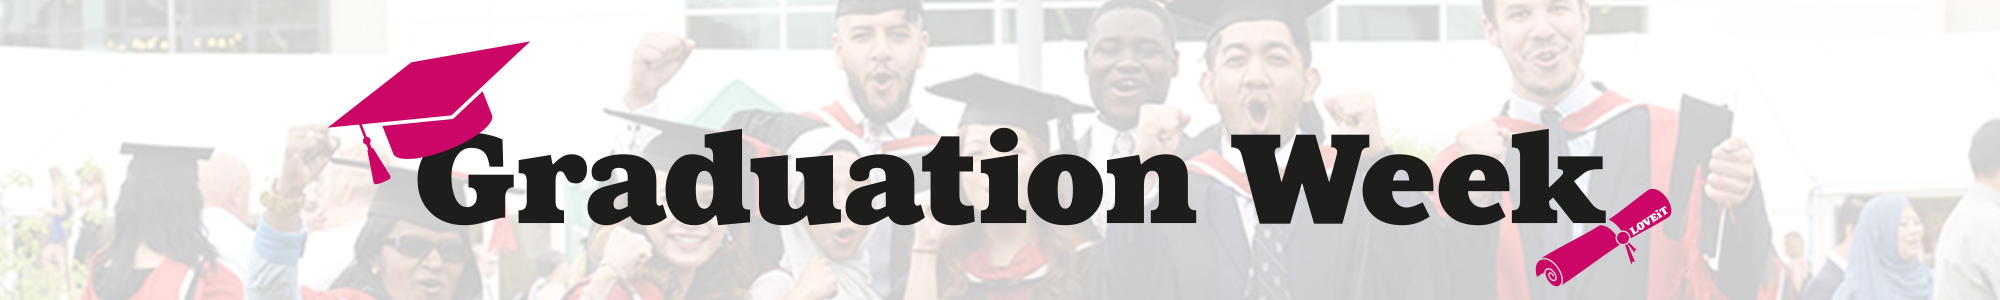 Graduation week2019 small web